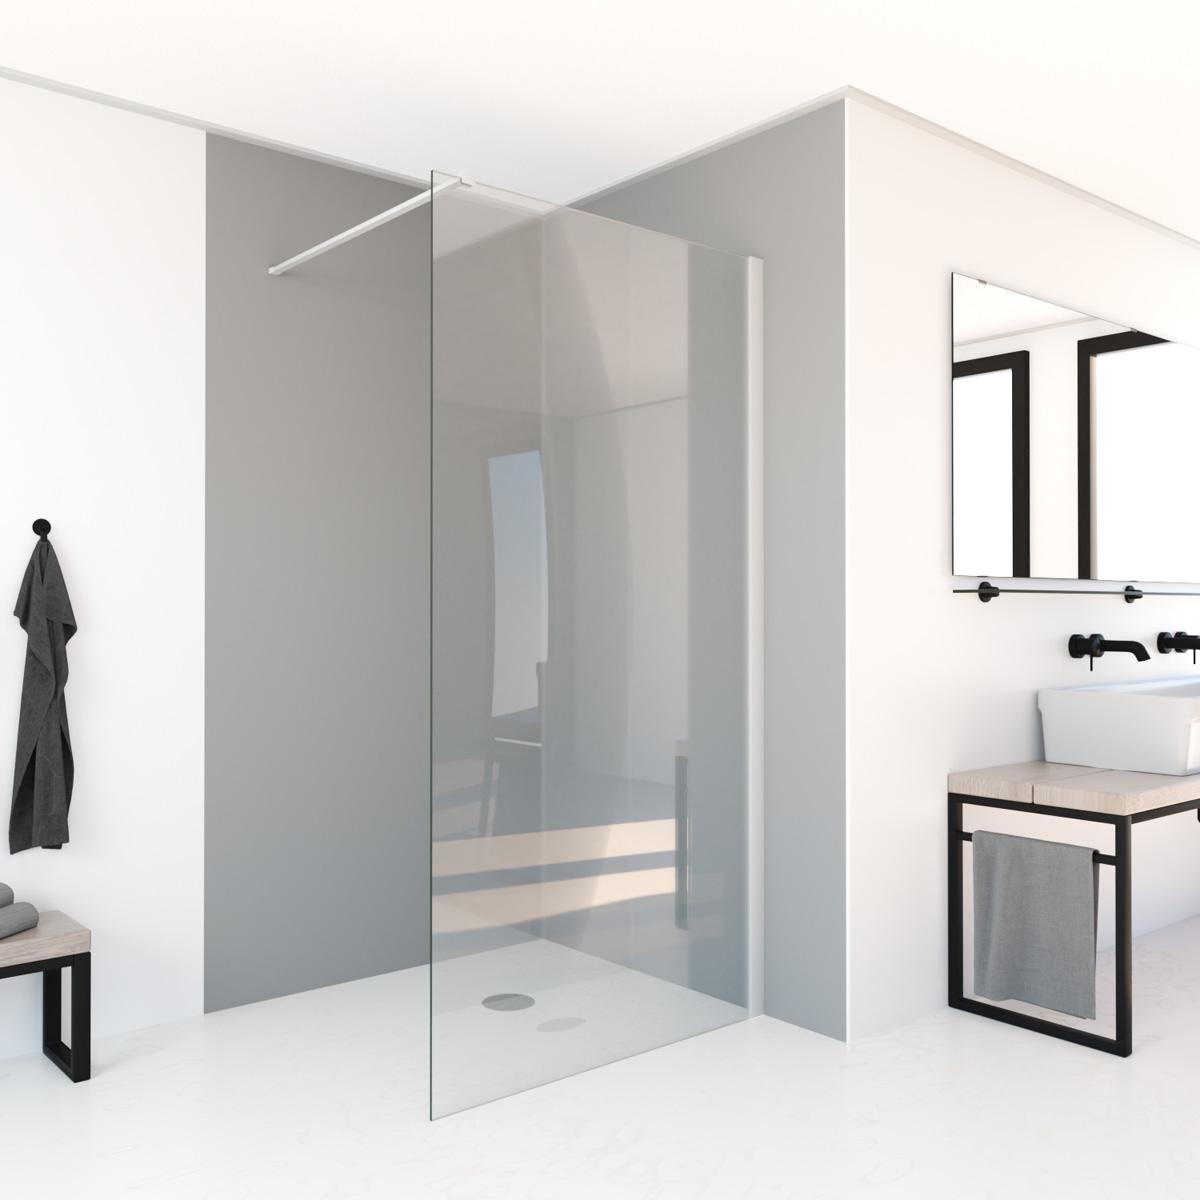 Saniclear Bianco inloopdouche mat wit 90x200cm anti-kalk coating